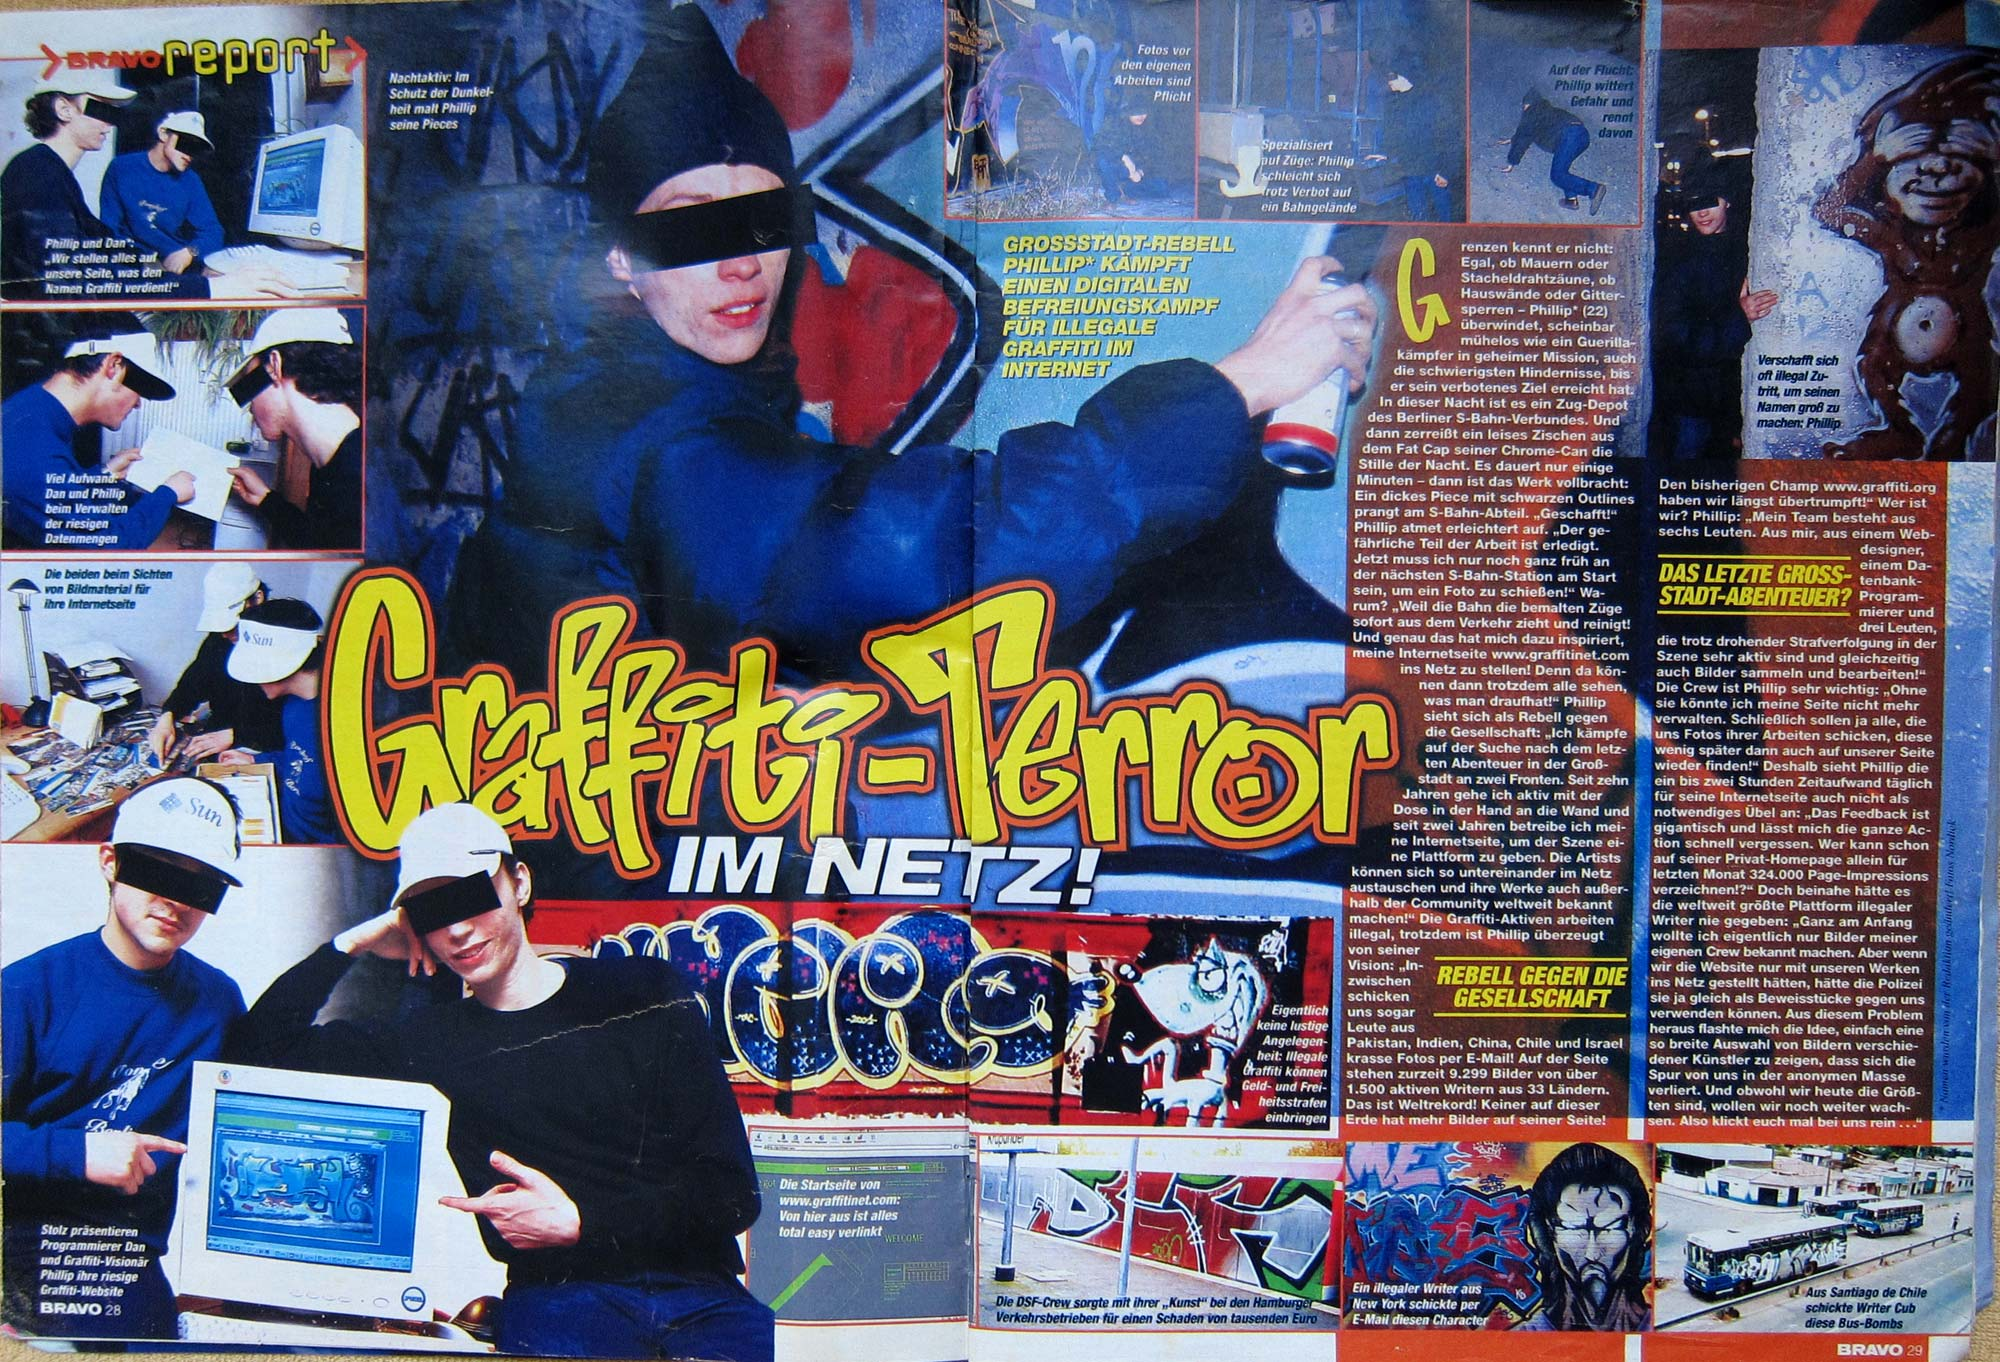 Bravo Report: Graffitinet.com